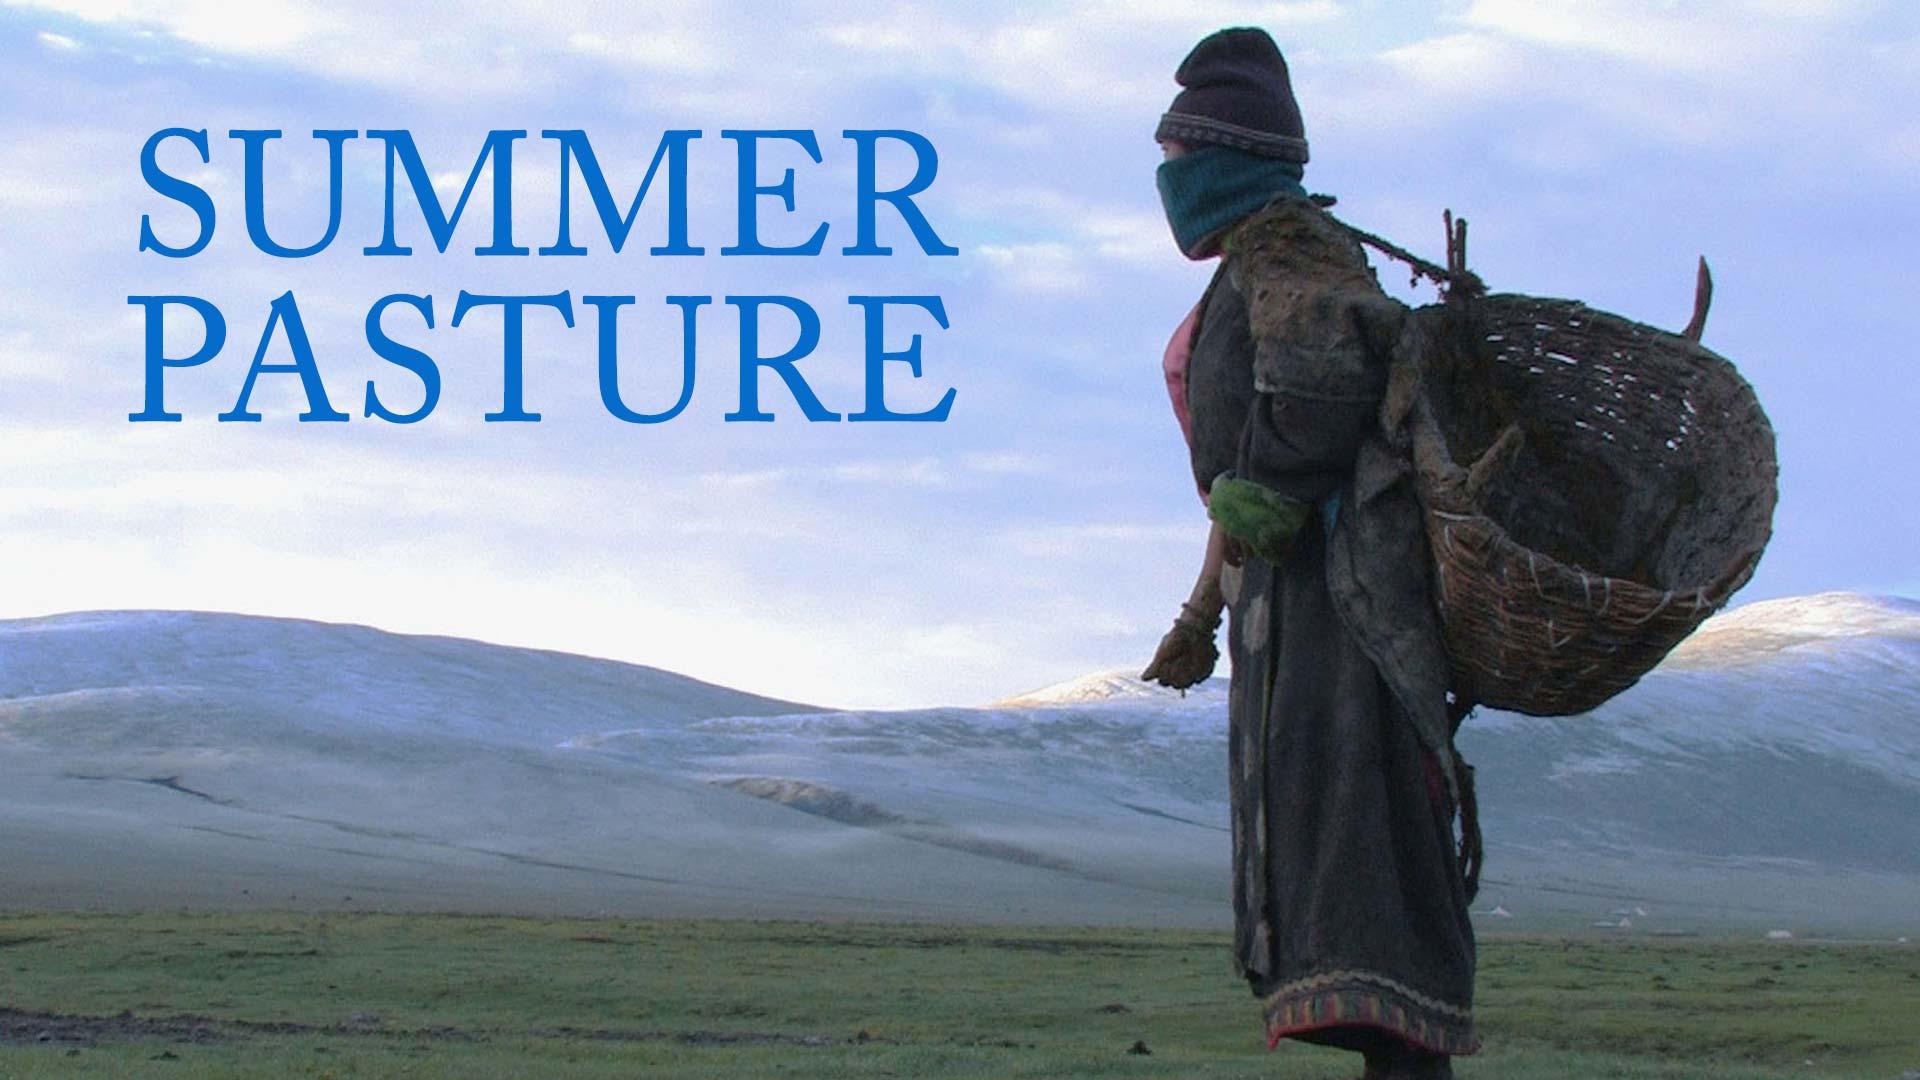 Summer Pasture - image